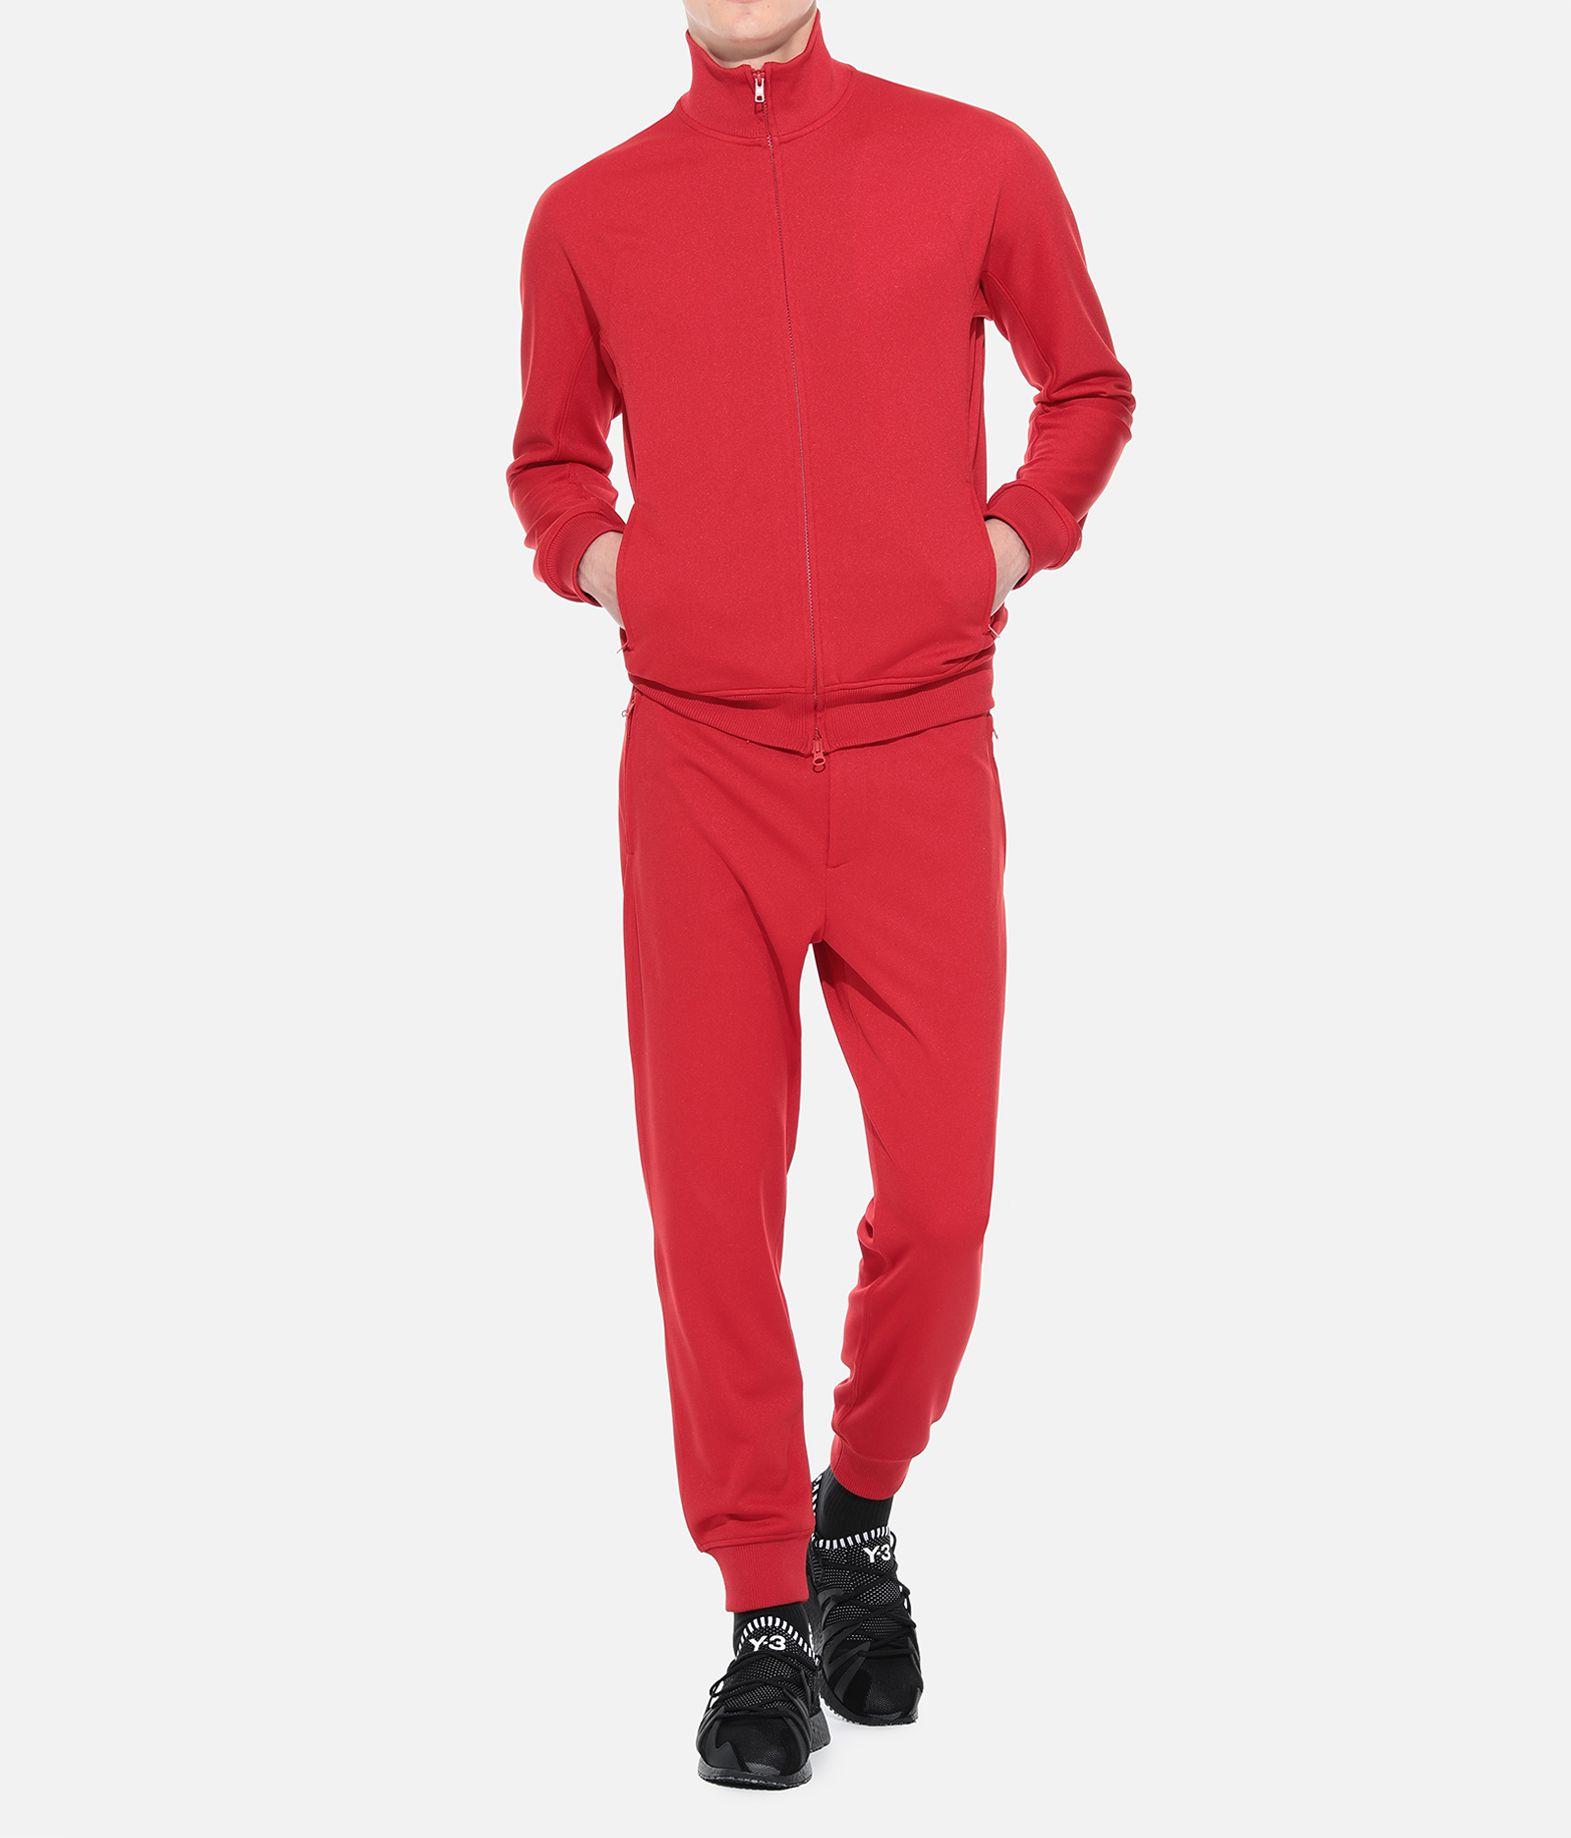 Y-3 Y-3 Classic Track Pants Тренировочные брюки Для Мужчин a